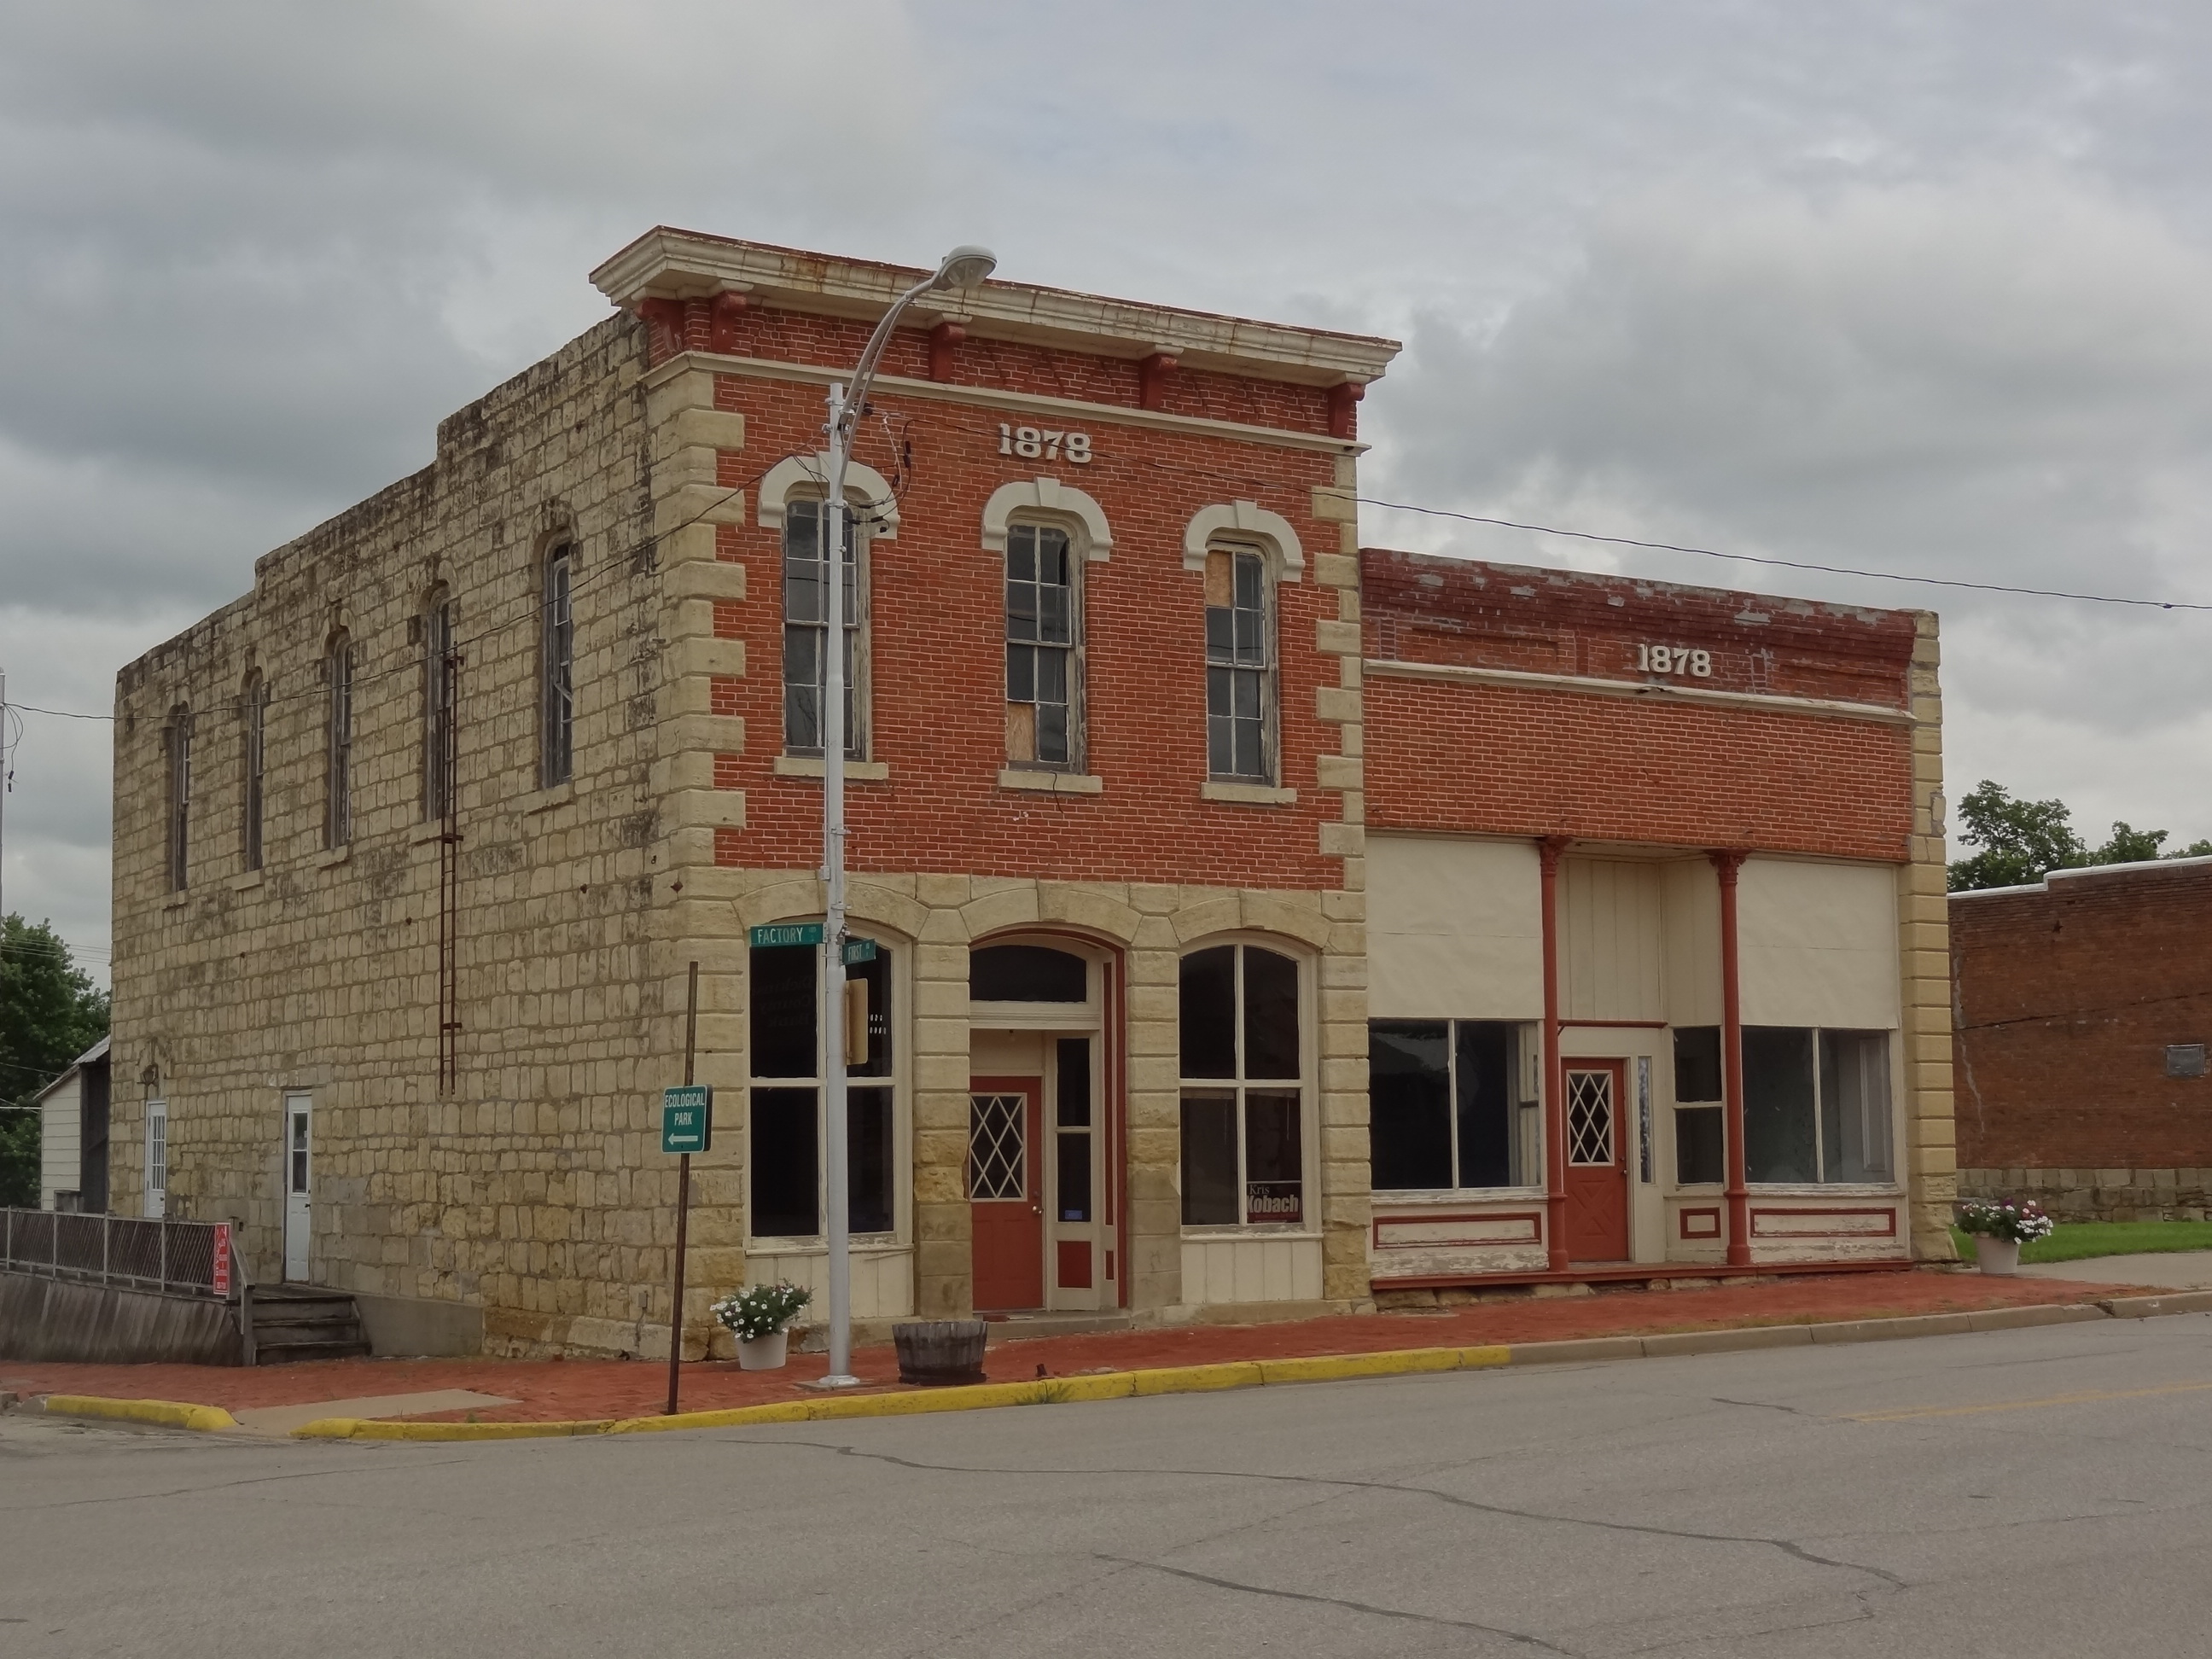 Kansas dickinson county abilene - Patriotic Silo Near Abilene Ks